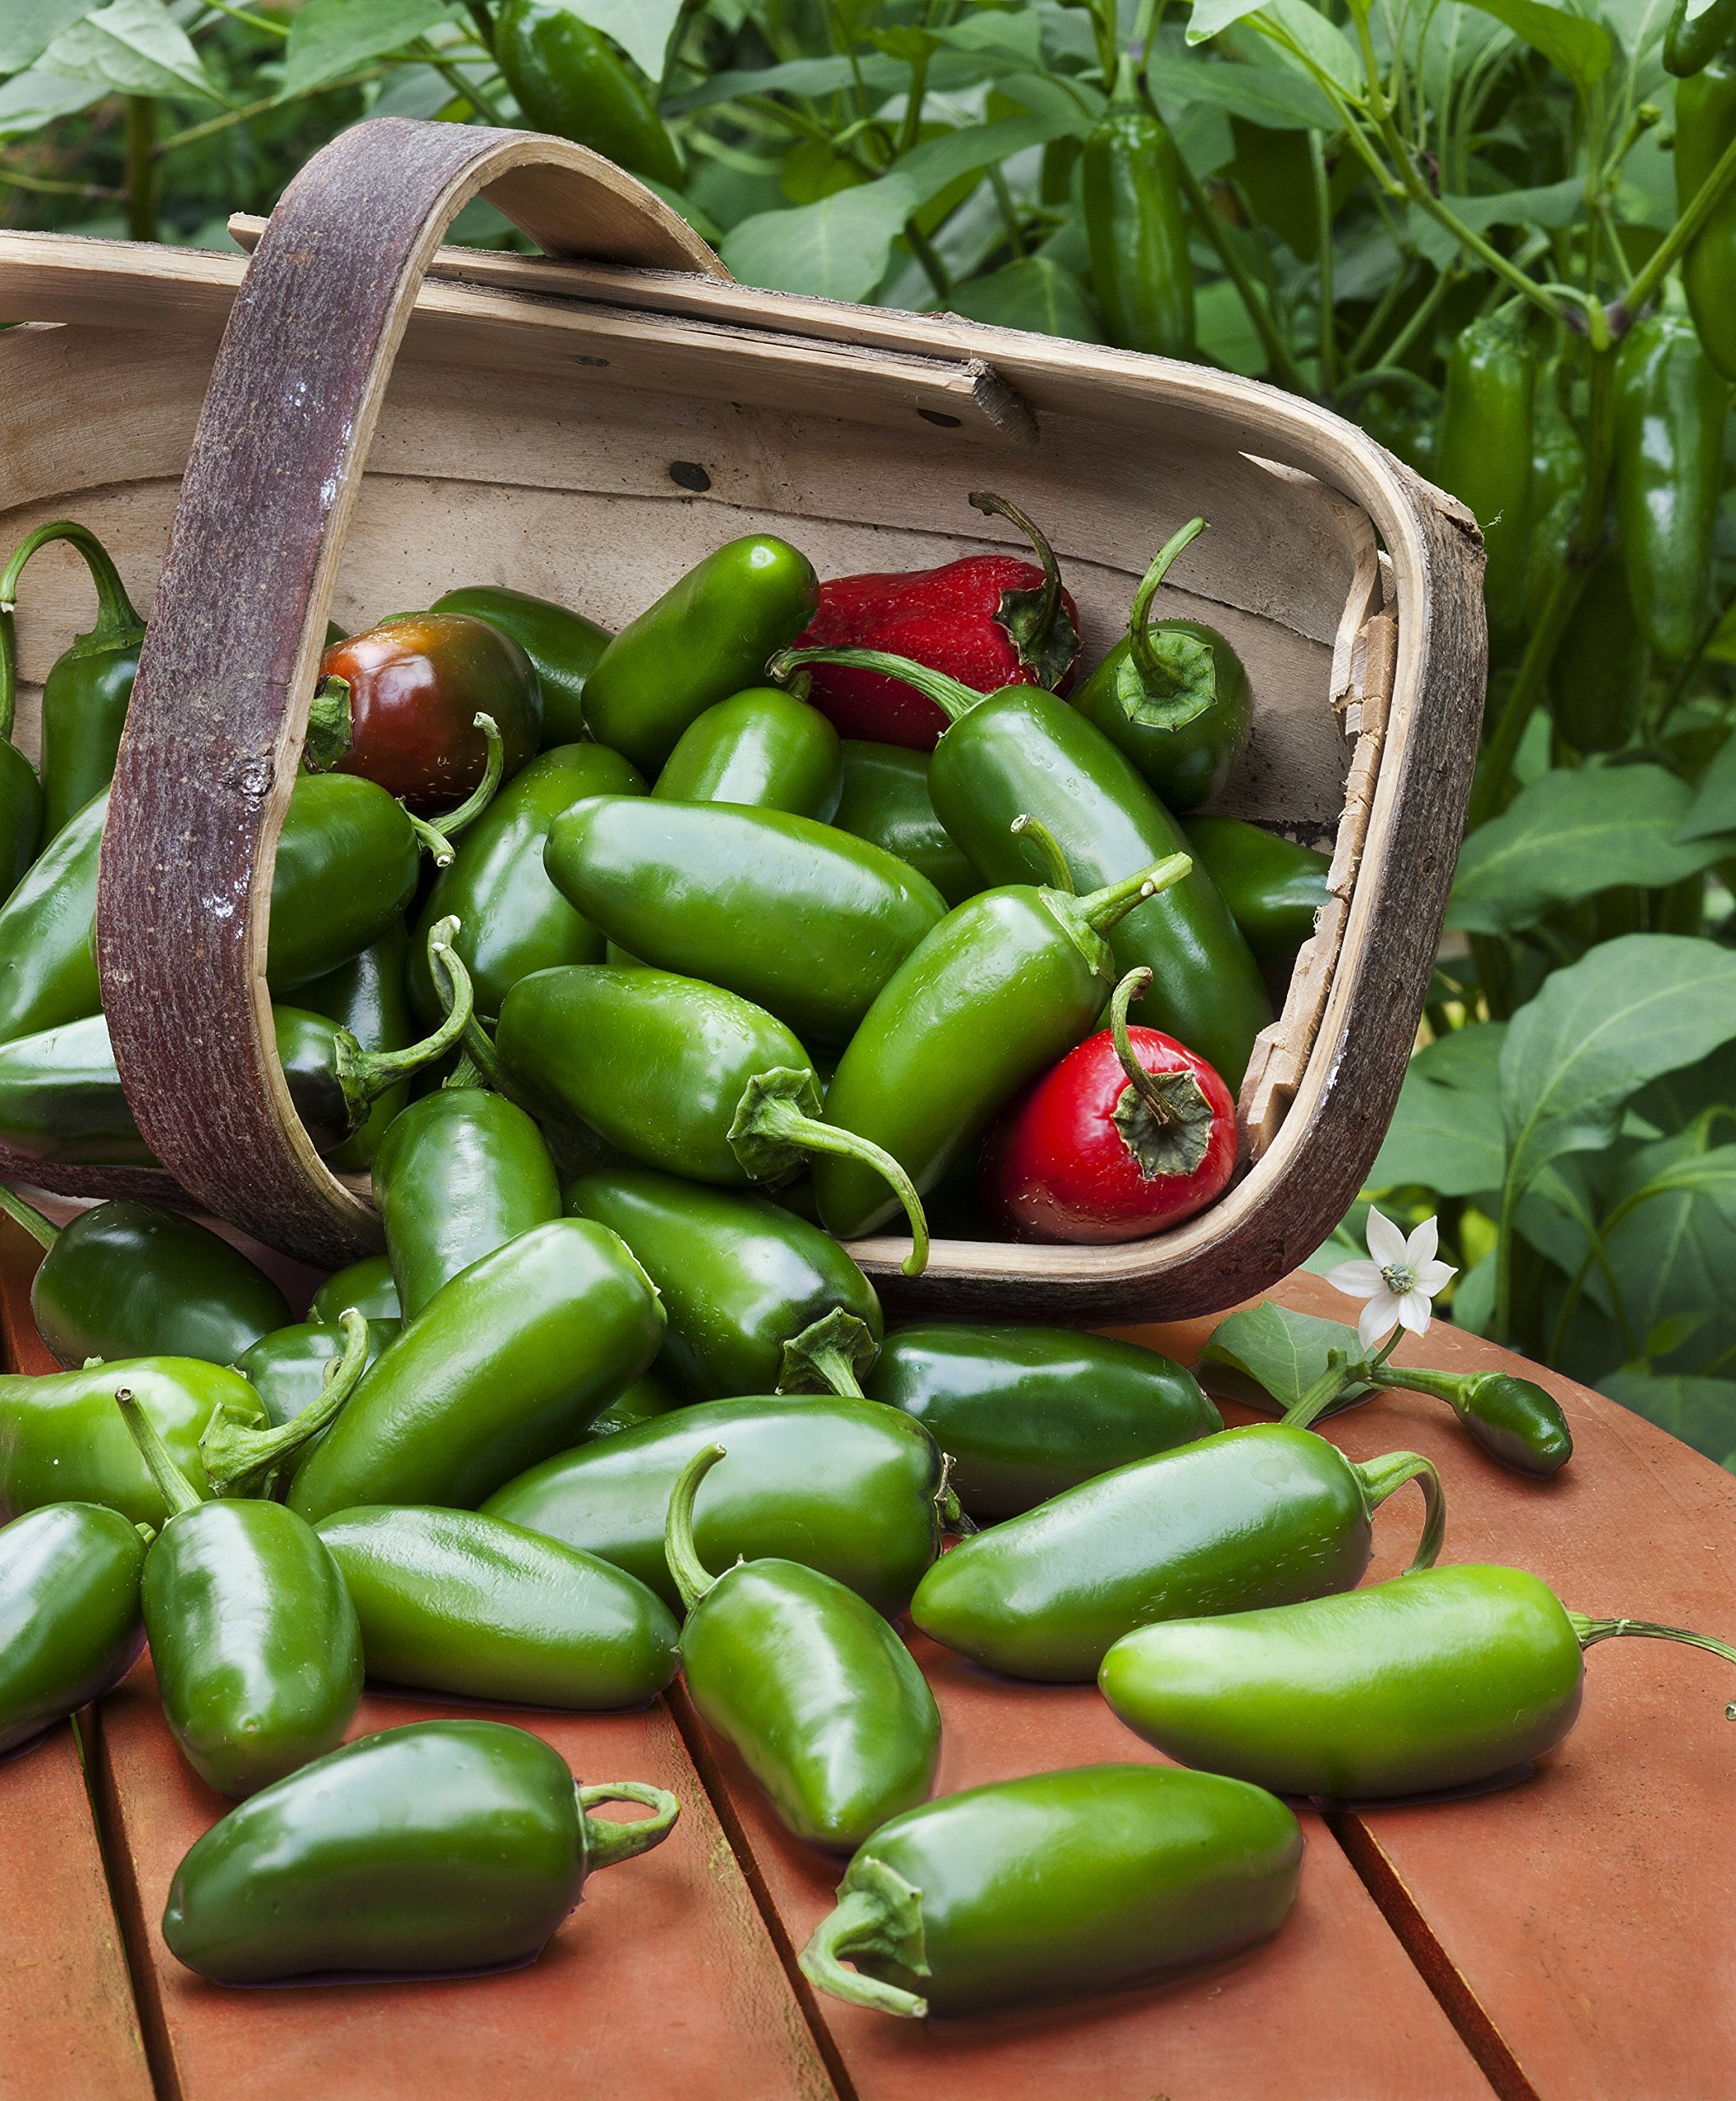 Bonnie Plants Jalapeno Hot Pepper Live Vegetable Plants - 4 Pack | Most Popular Chile Pepper | Non-GMO | 24 - 48 Inch Plants | 3 Inch Pepper Size by Bonnie Plants (Image #8)